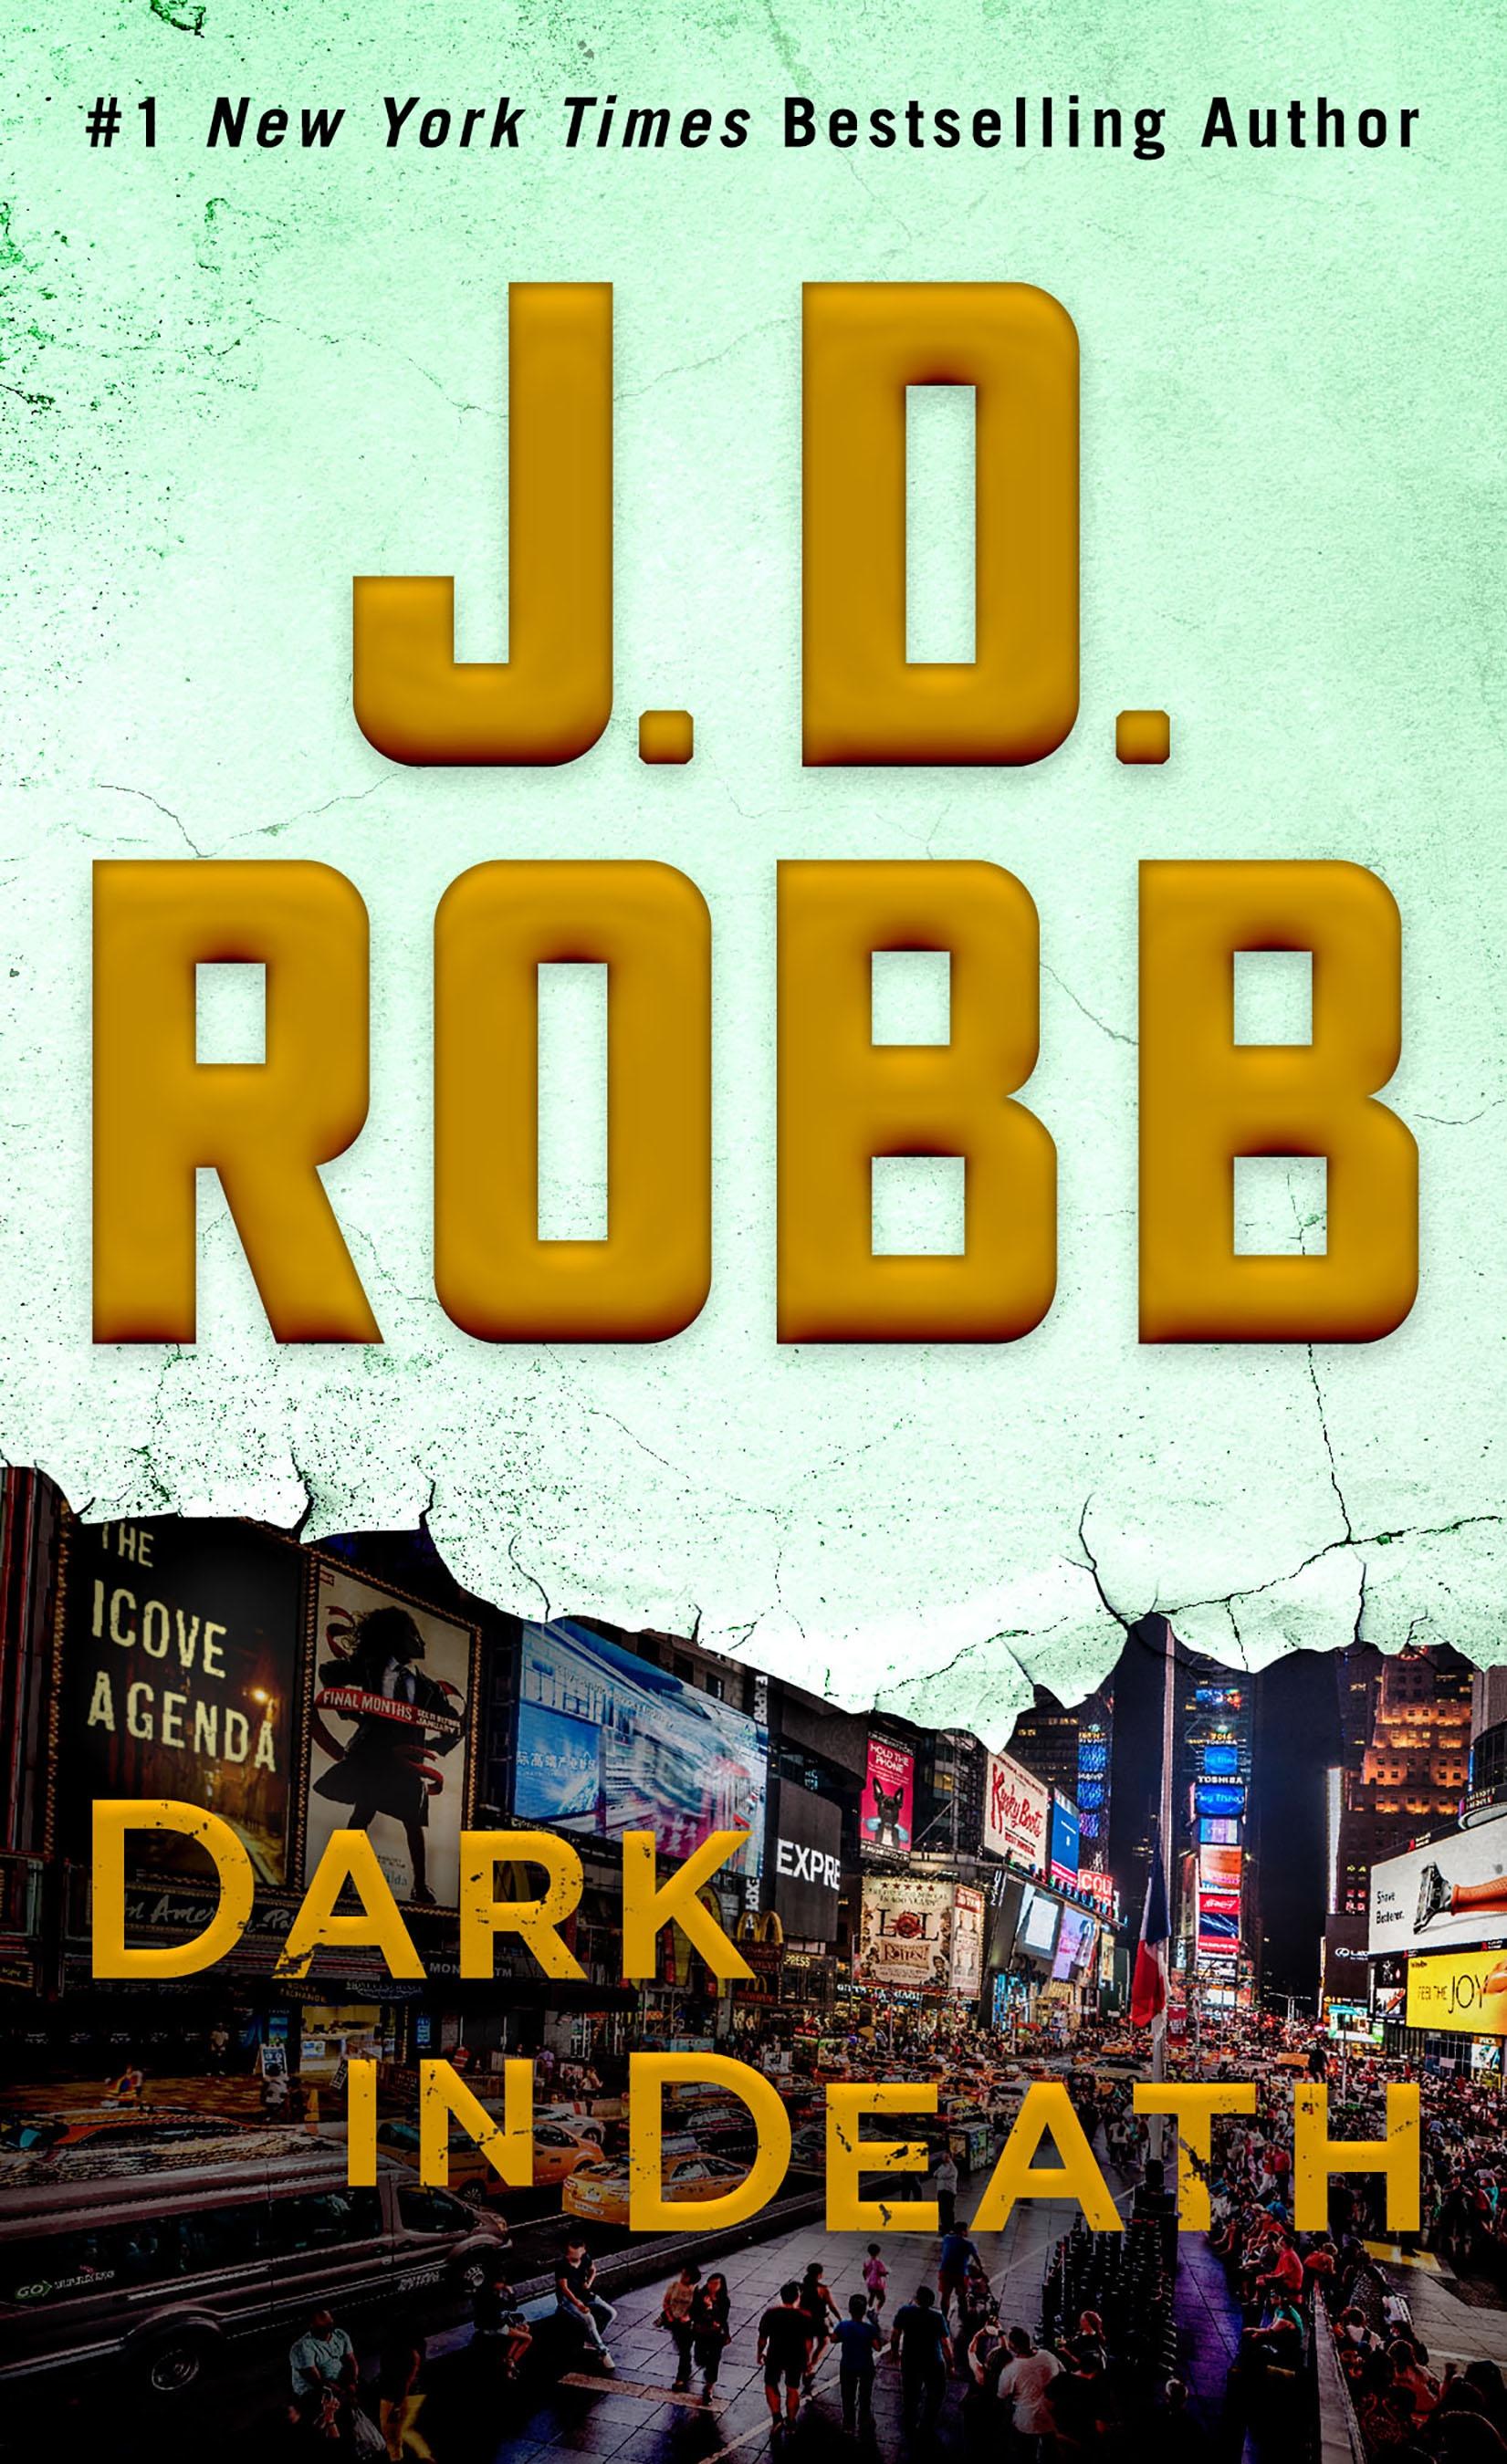 Dark in death cover image